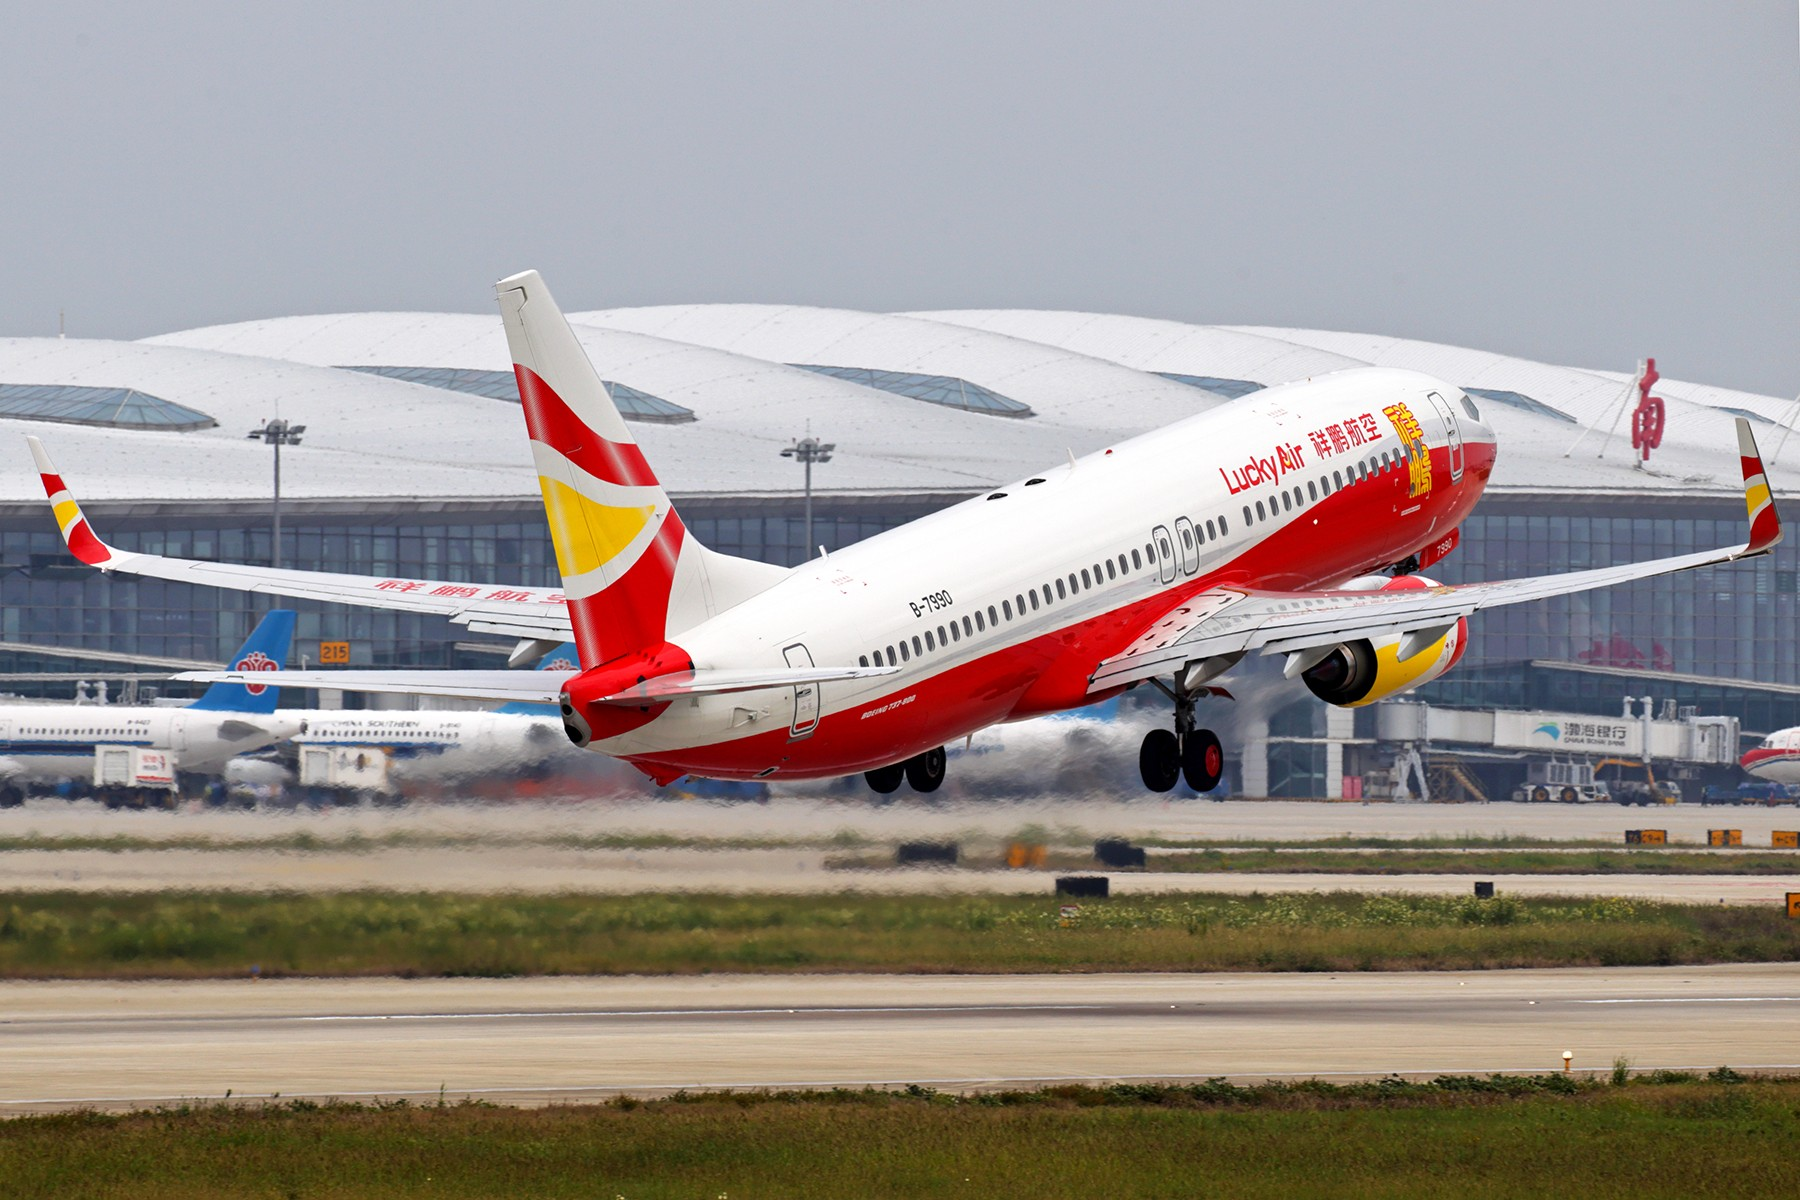 Re:[原创]【BLDDQ】******NKG07/25单跑道运行中****** BOEING 737-800 B-7990 中国南京禄口国际机场